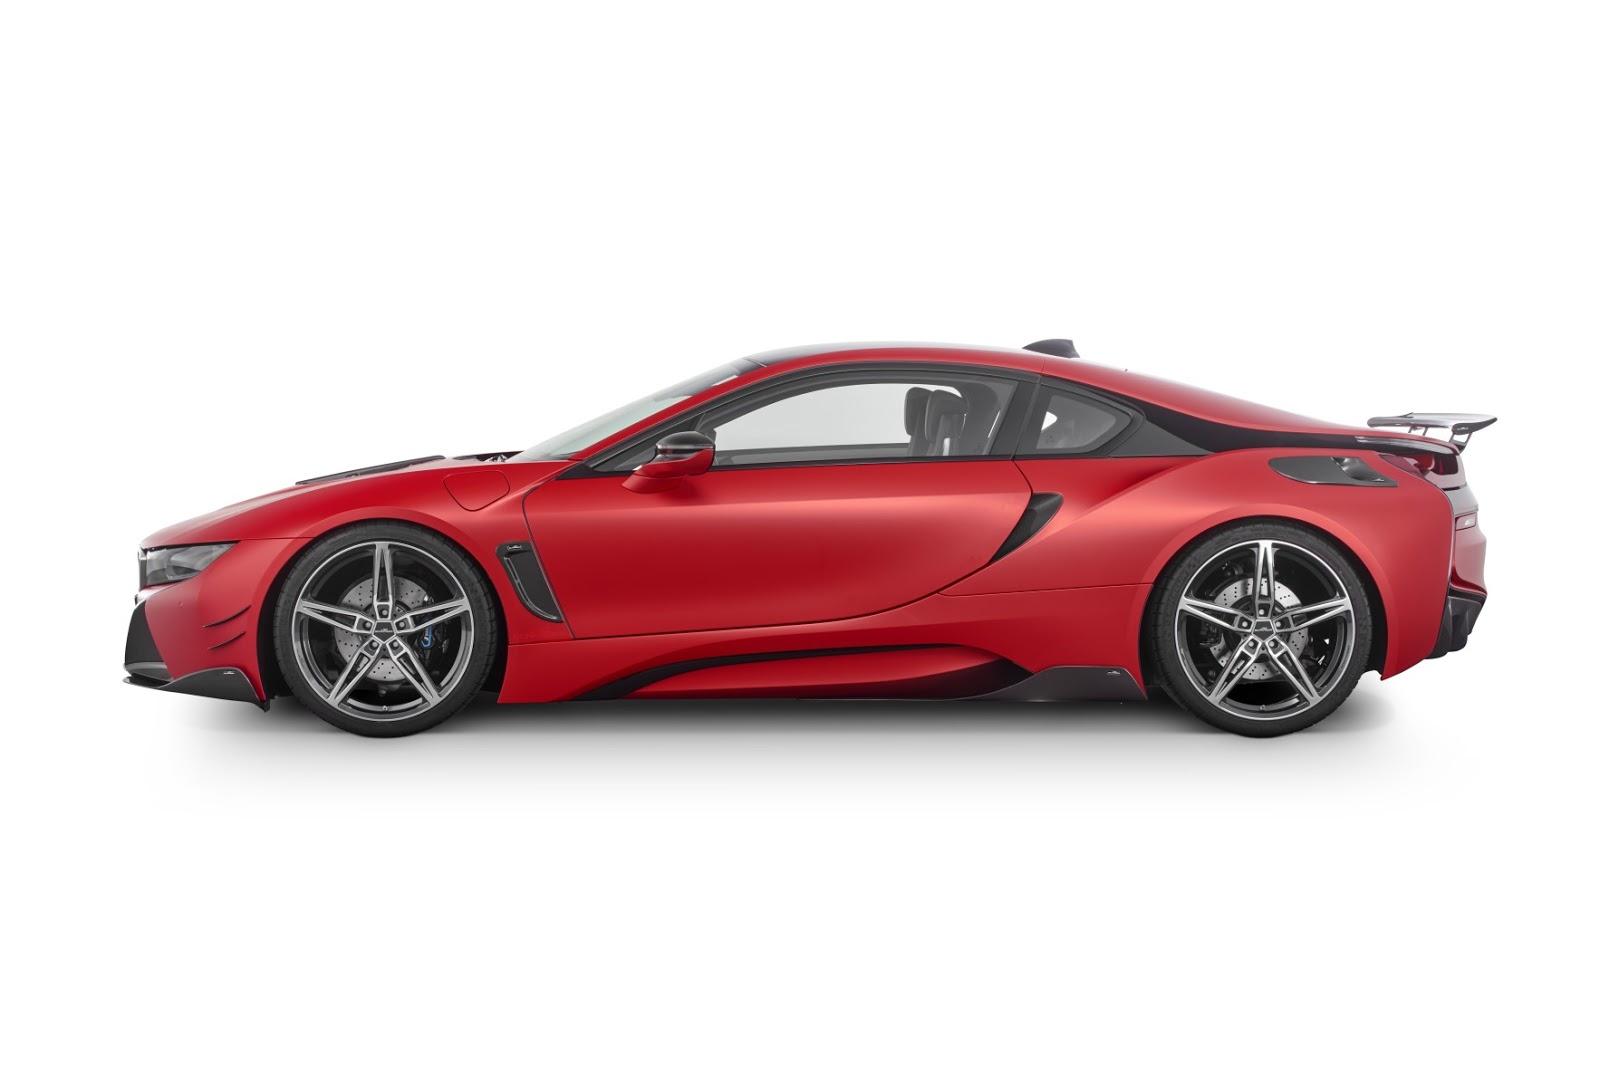 BMW i8 with Carbon Aerodynamic Accessories by AC Schnitzer (9)